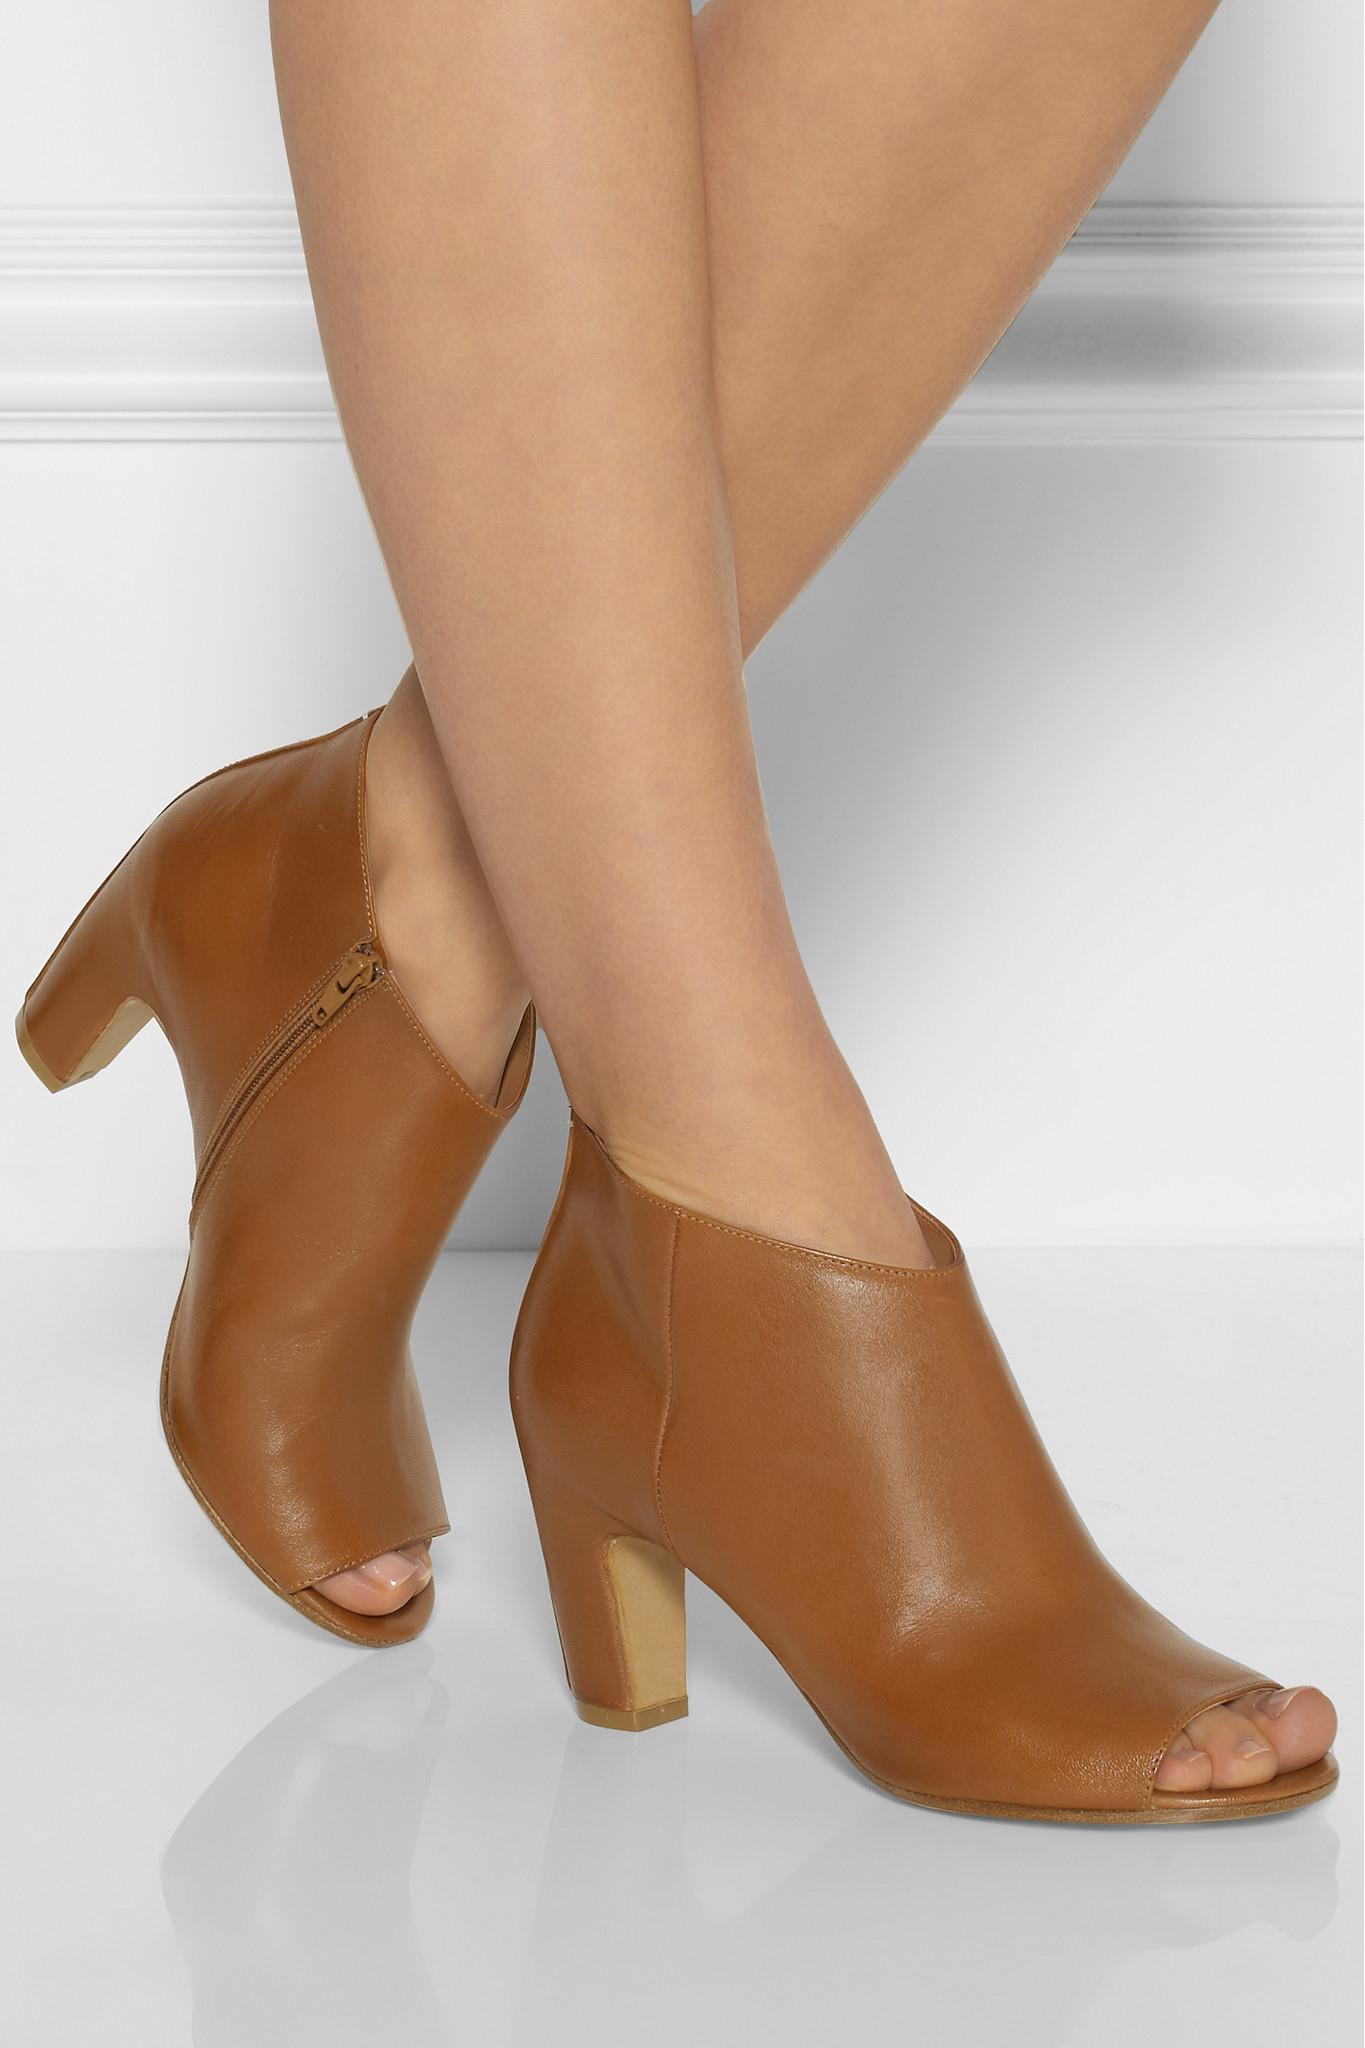 Maison Margiela Peeptoe Leather Booties c0O90uN3